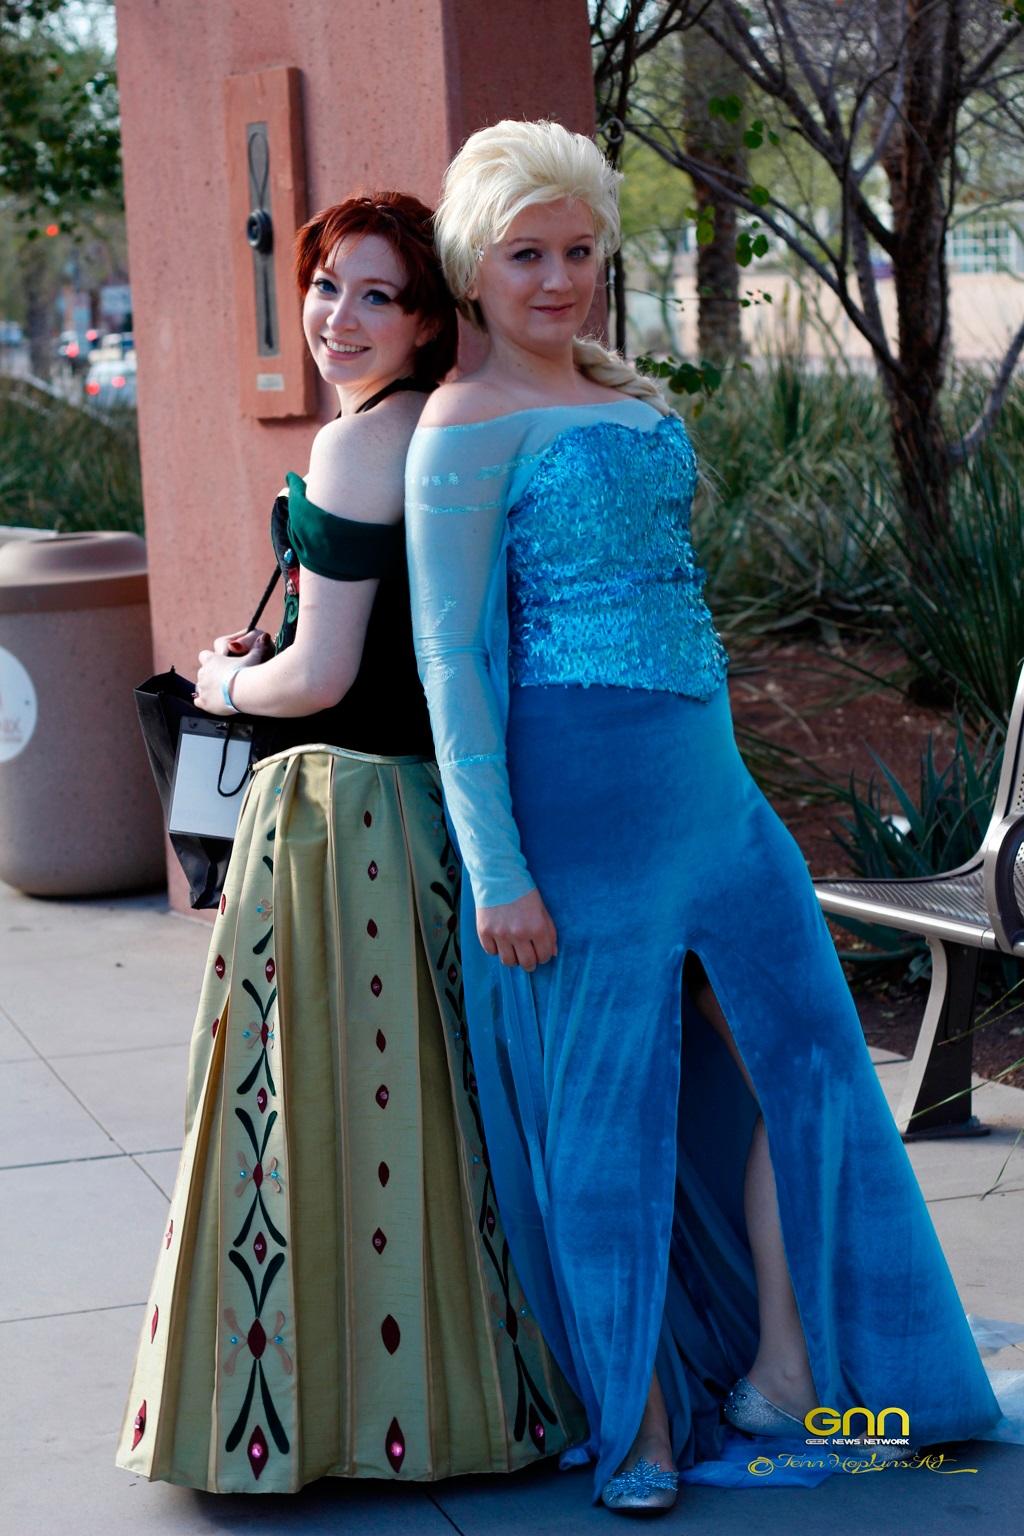 ... Frozen Disney Elsa and Anna cosplay Costume~ by Drkldysebastina  sc 1 st  DeviantArt & Frozen Disney Elsa and Anna cosplay Costume~ by Drkldysebastina on ...